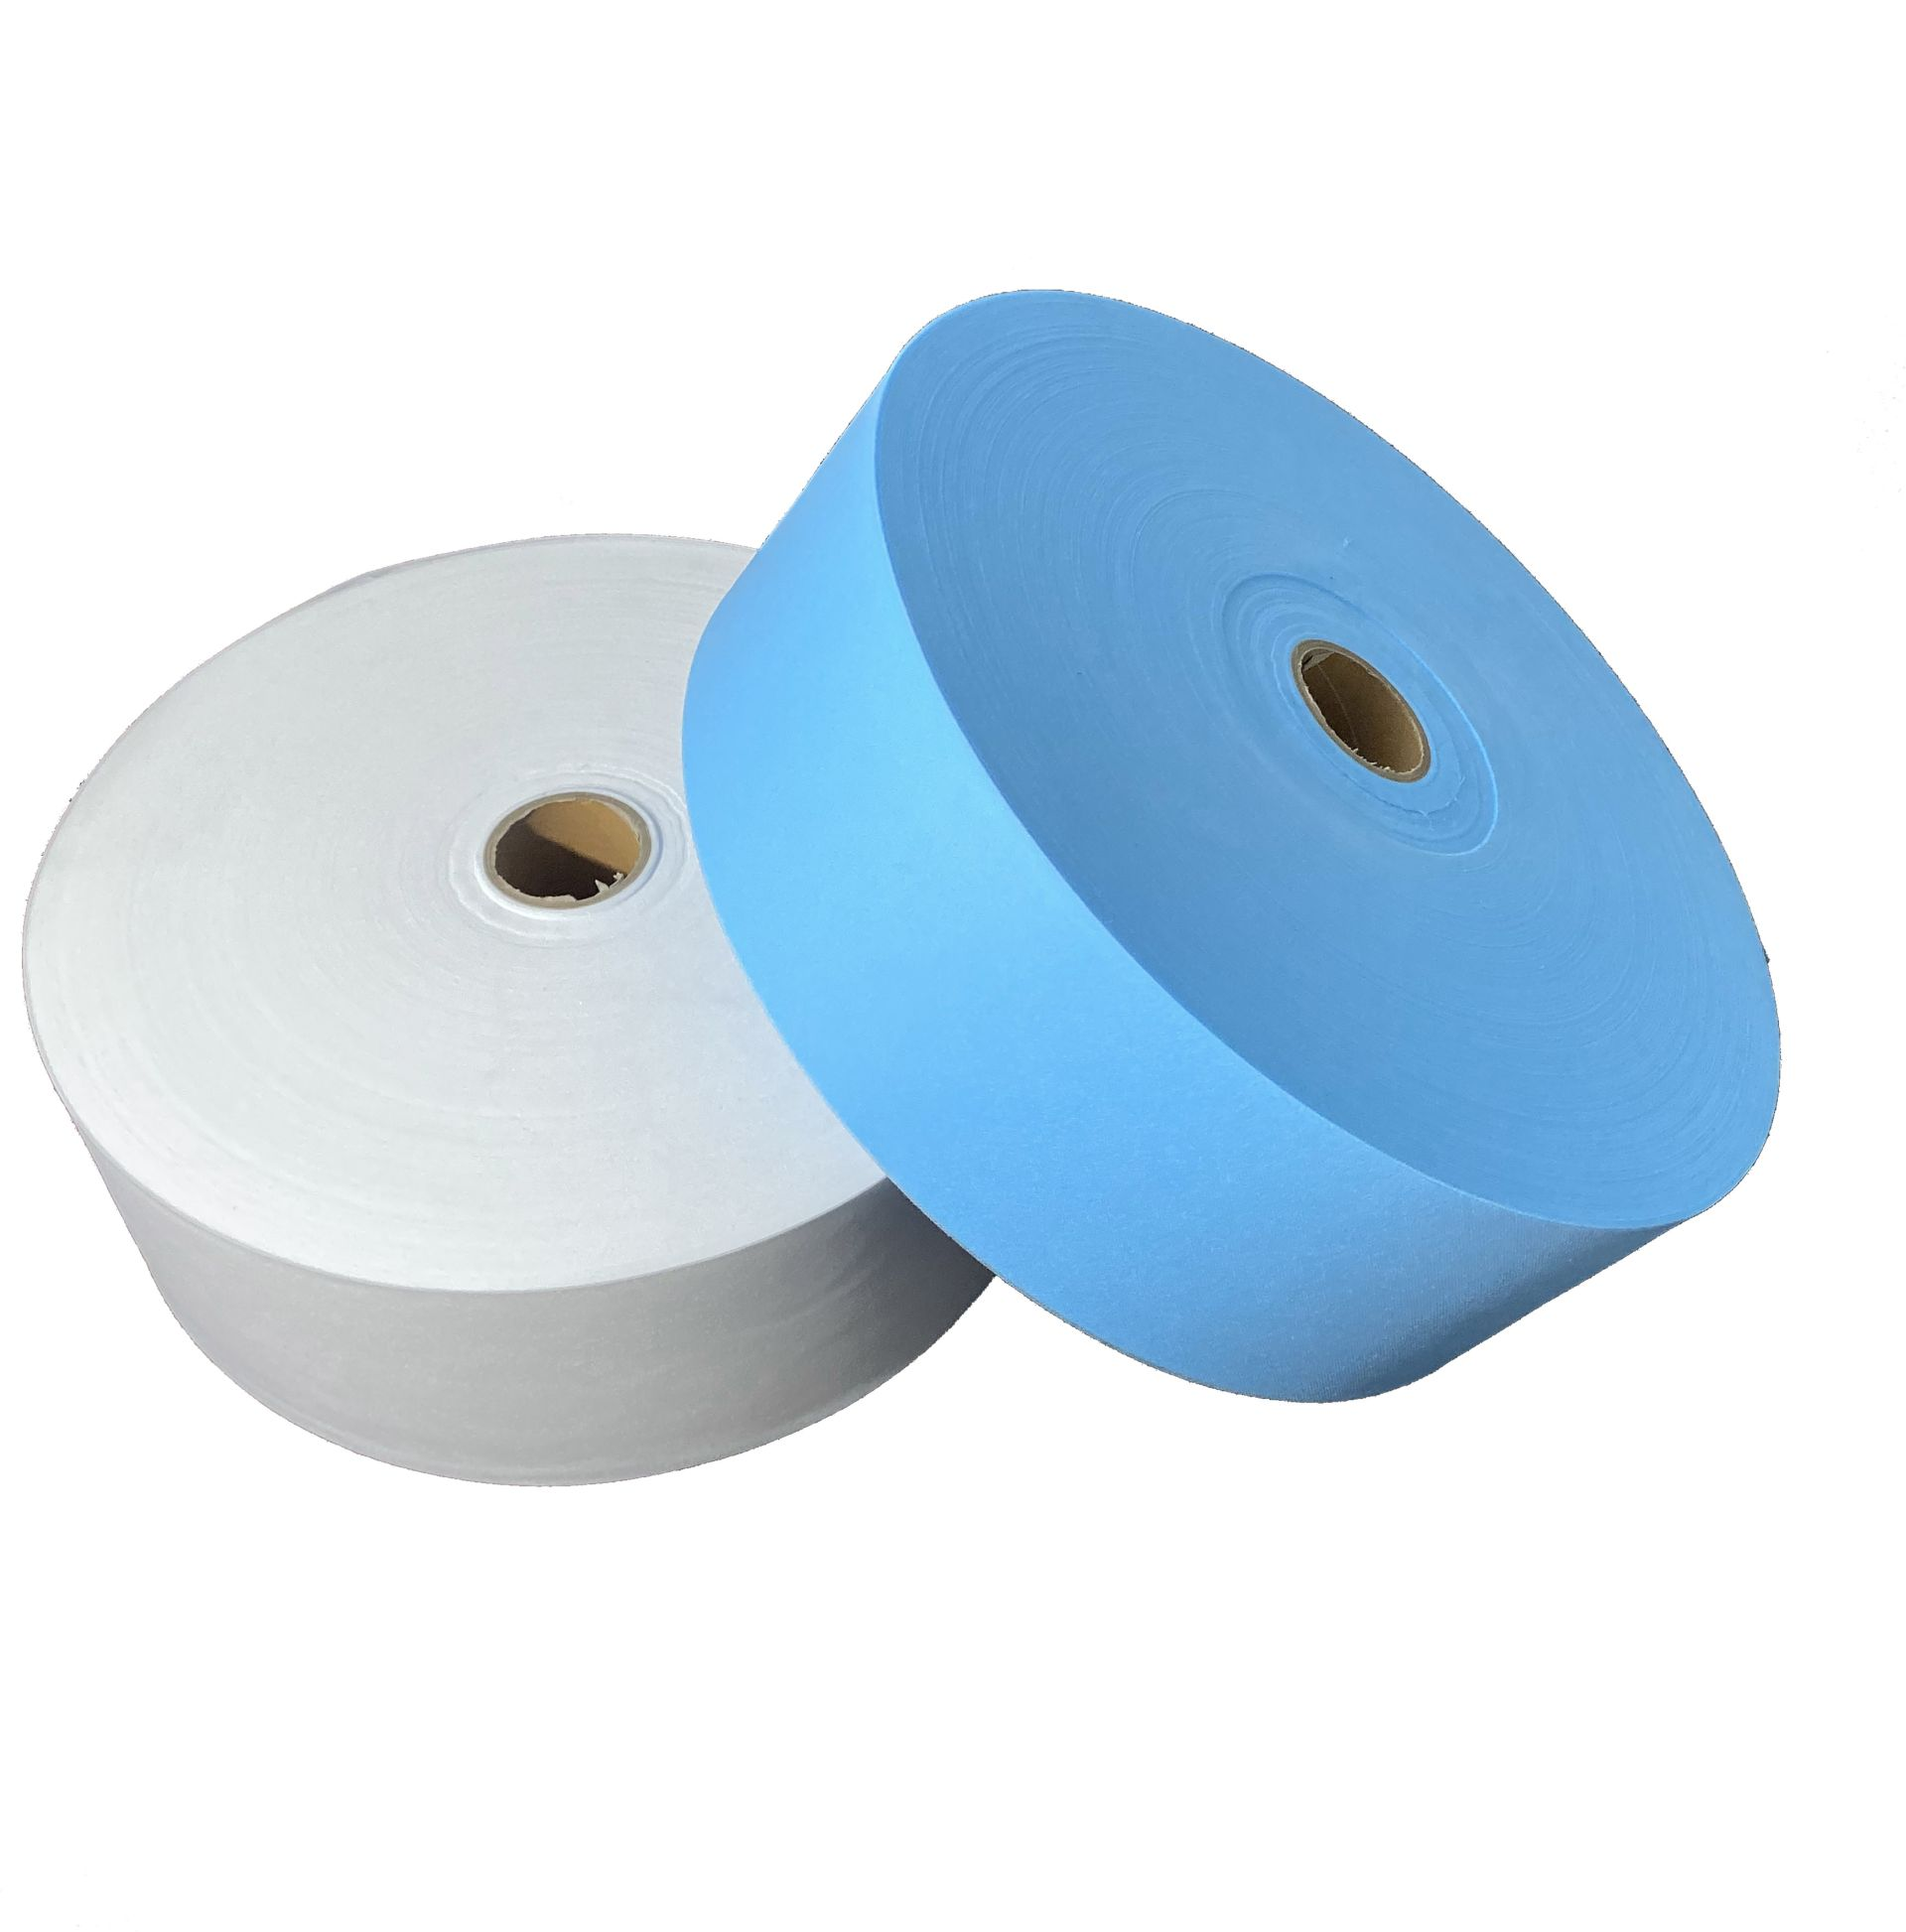 Spunbond 100% polypropylene nonwoven fabric